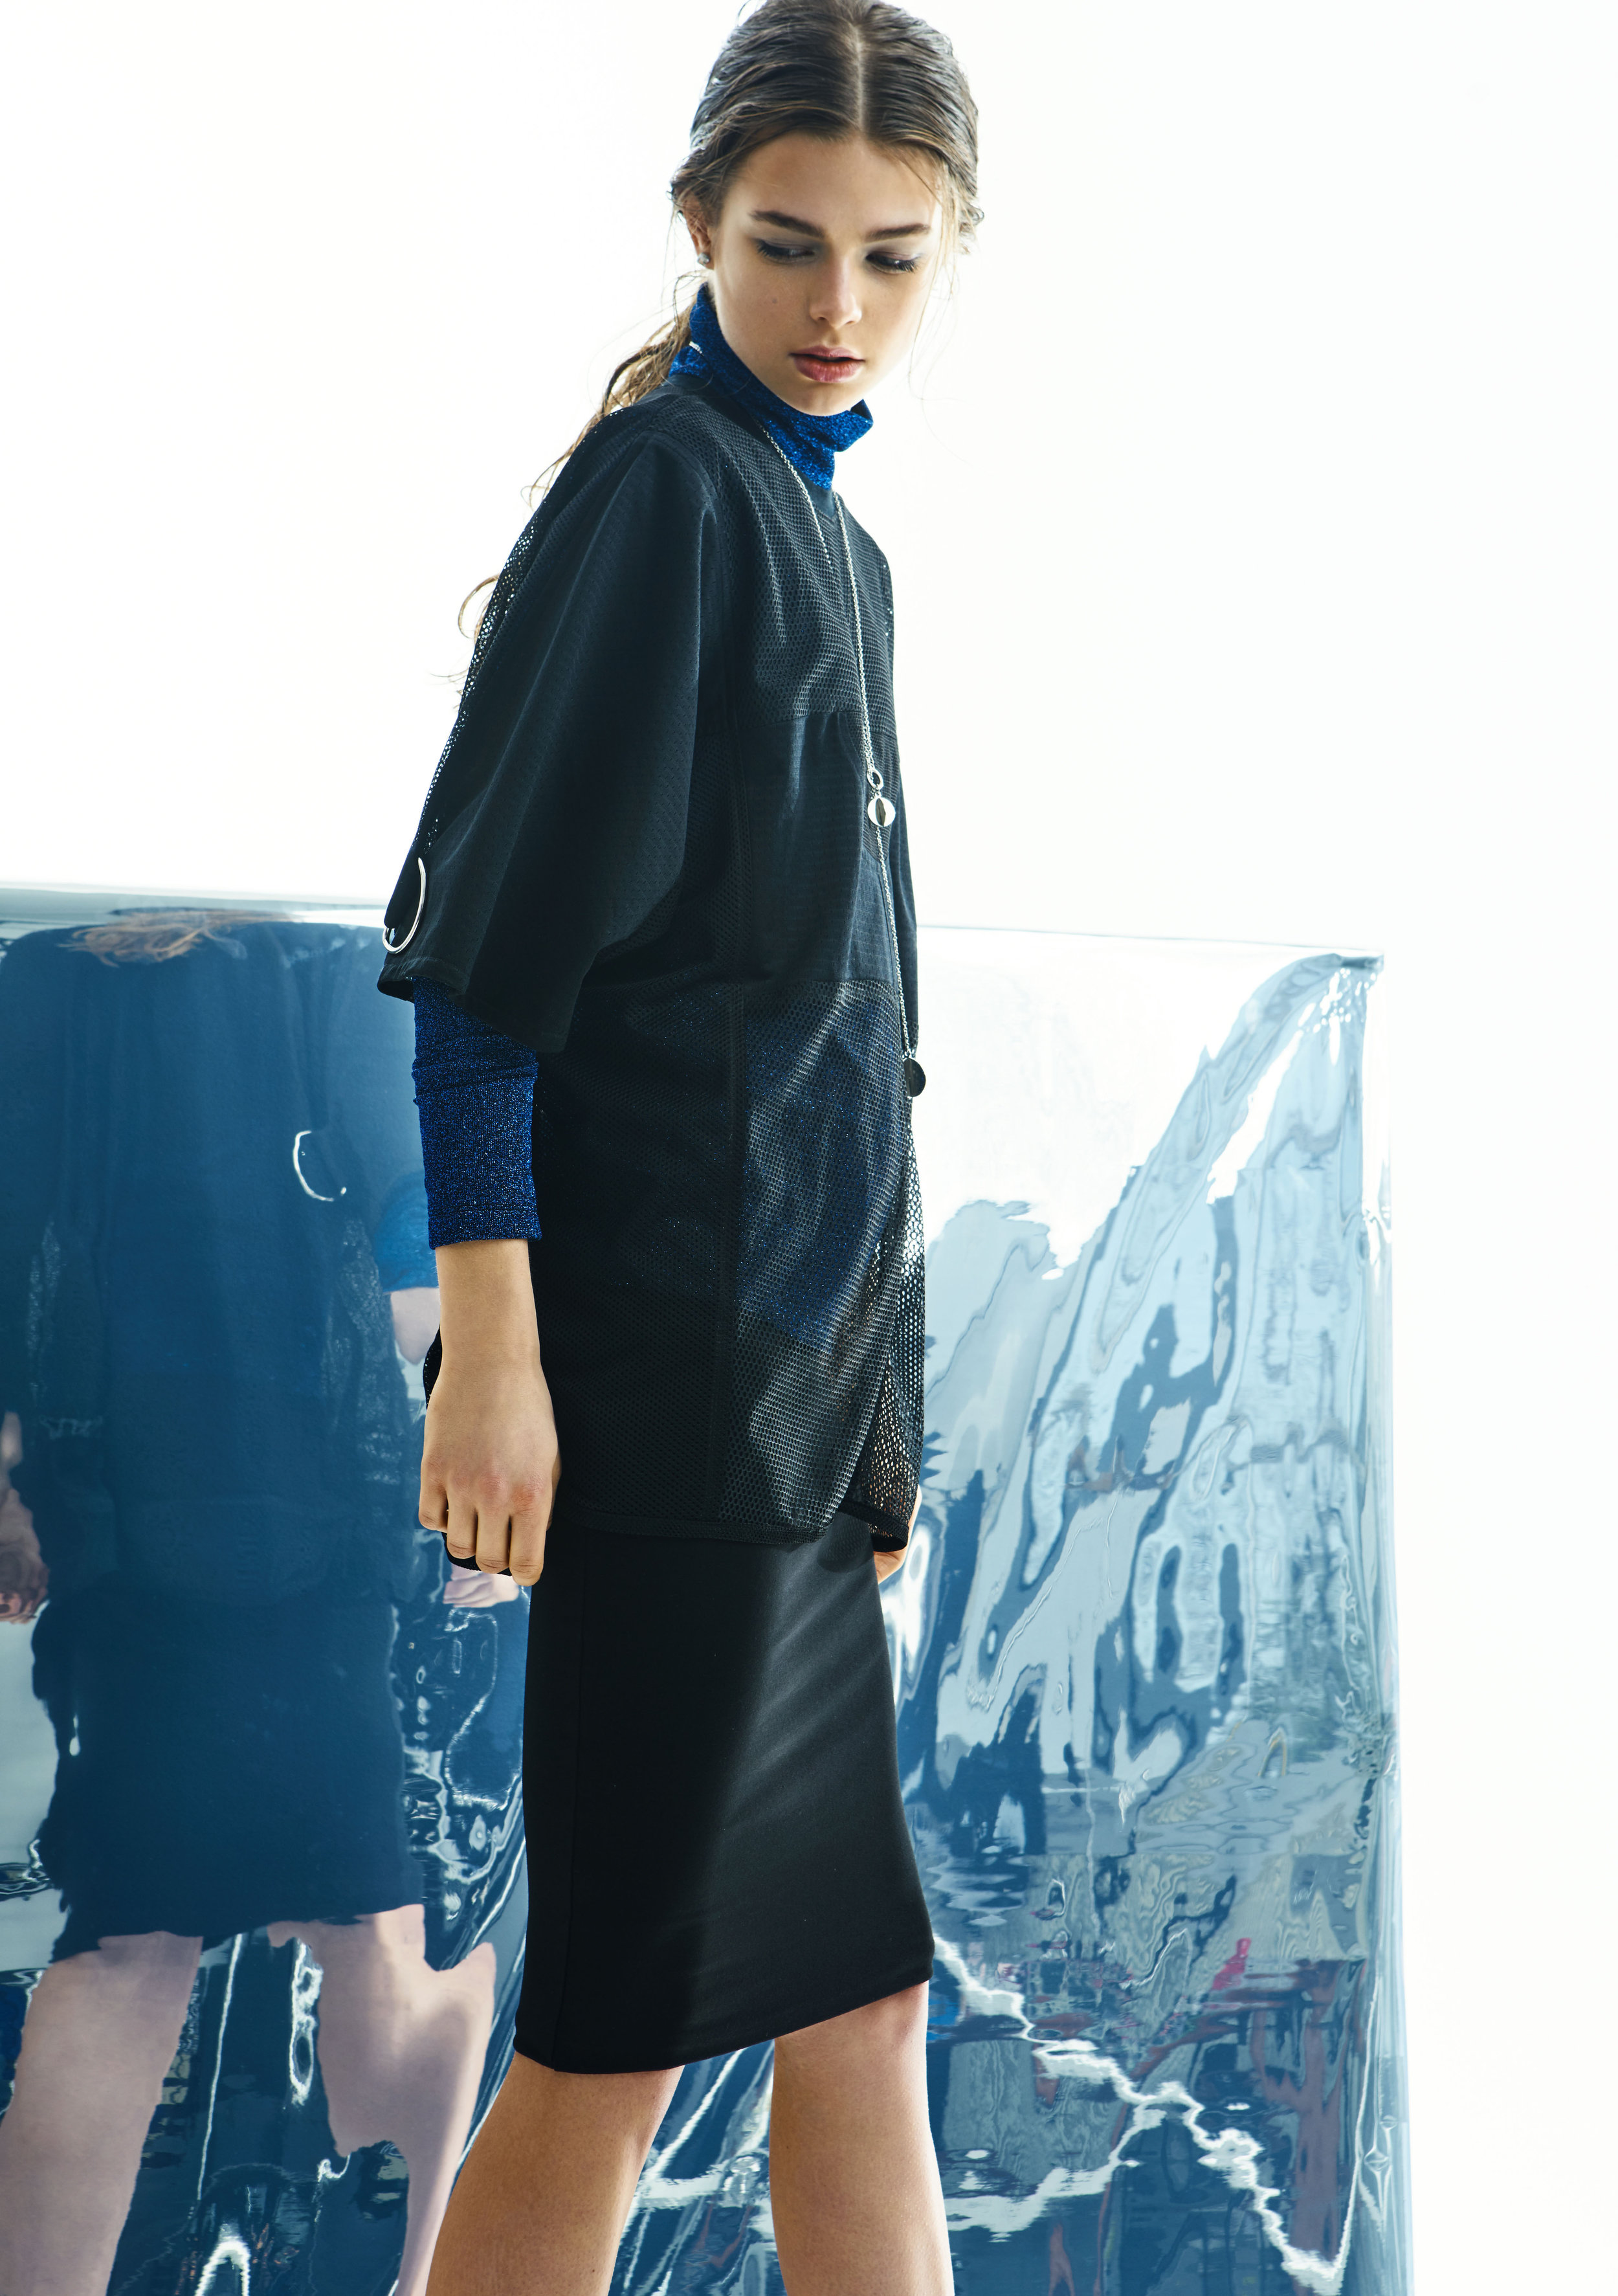 Shirt,Sample CM; polo neck,vintage; skirt,Norma Kamali;necklace,Yael